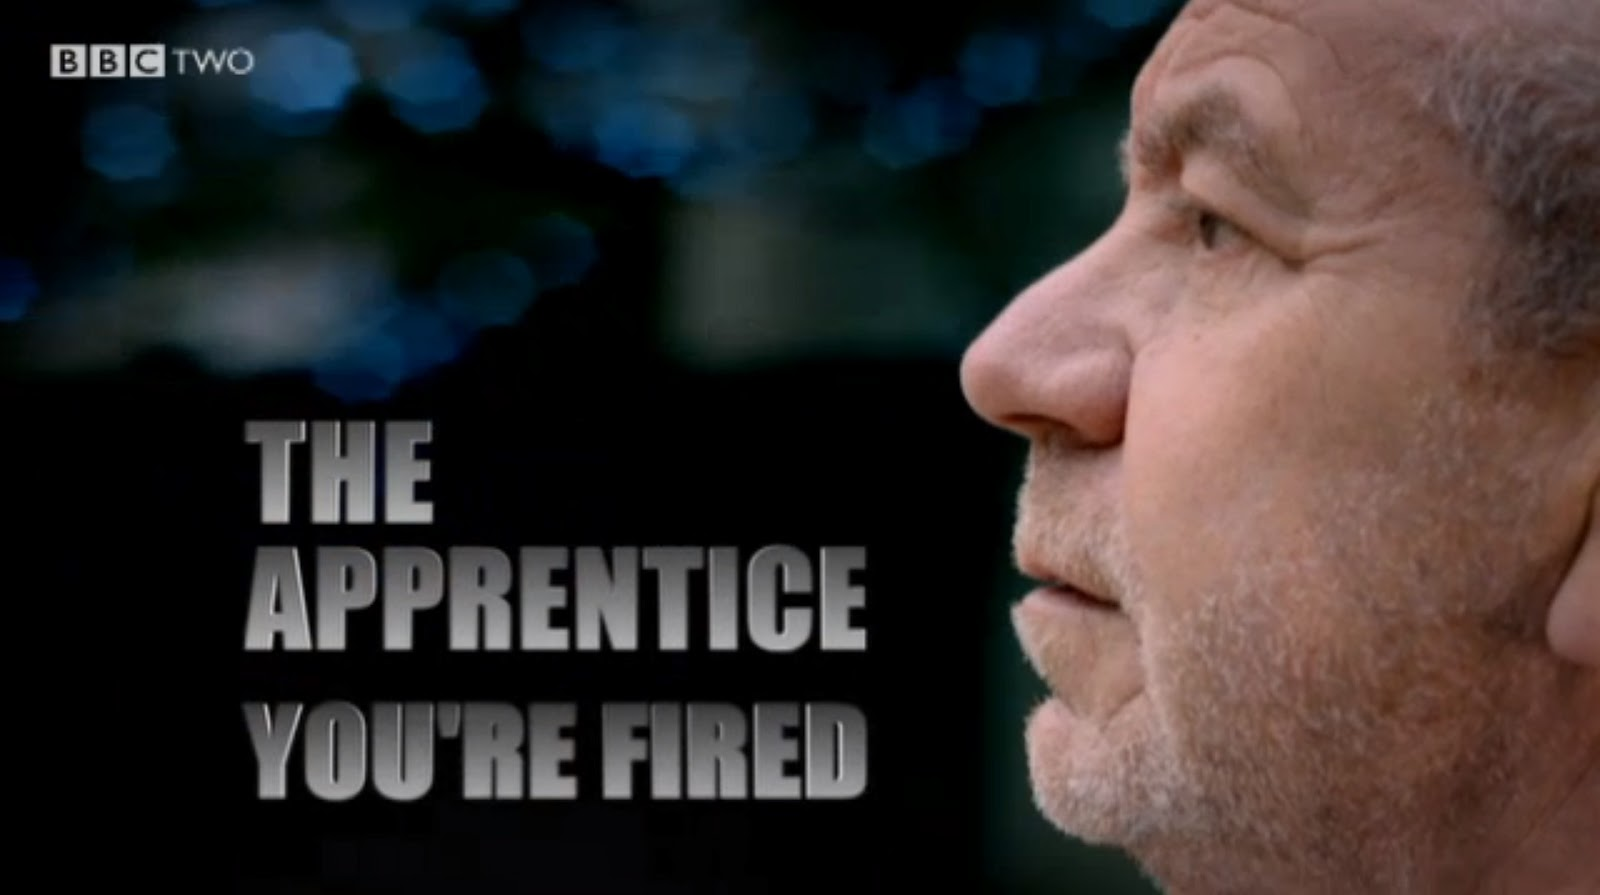 The Apprentice Youre Fired S14E04 Bodybuilding Expo HDTV x264-PLUTONiUM